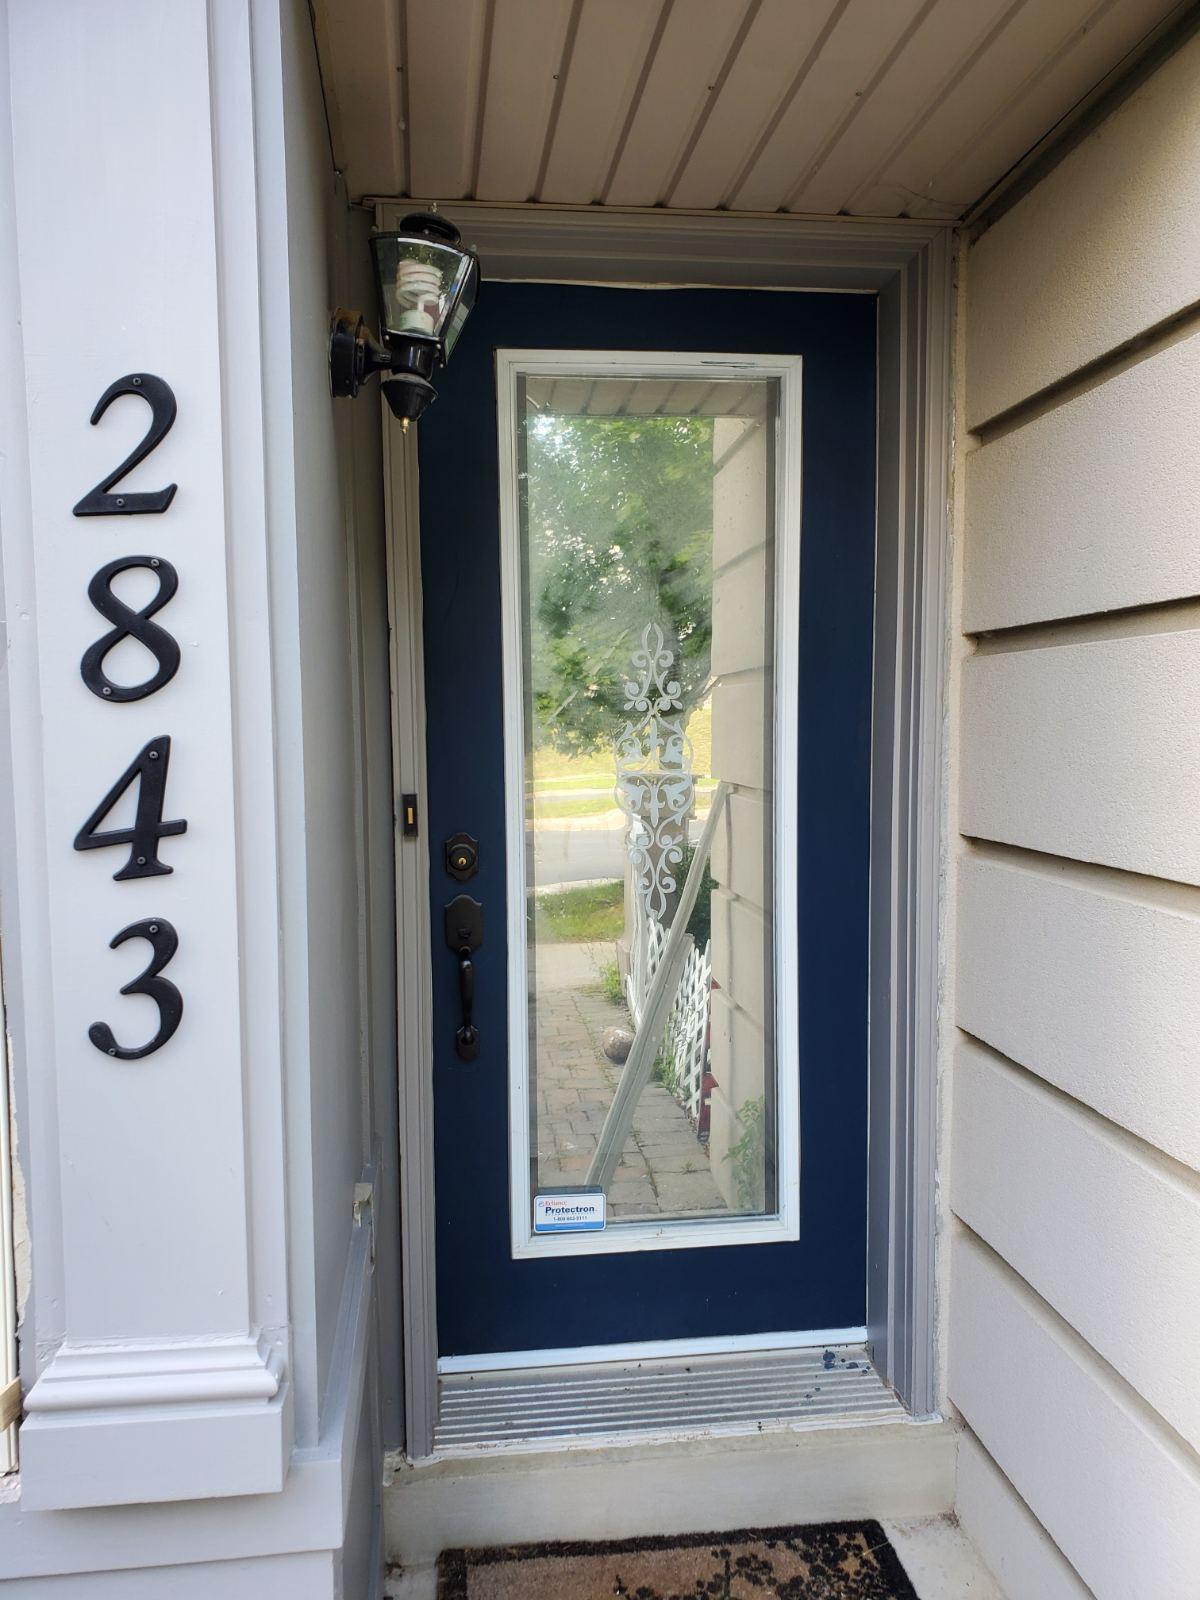 Blue Fiberglass and Steel Door Installation and Replacement, PVC Windows Woodbridge, Maple, Vaughan, King, Aurora, Nemwarket, Caledon, Nobleton, Kleinburg